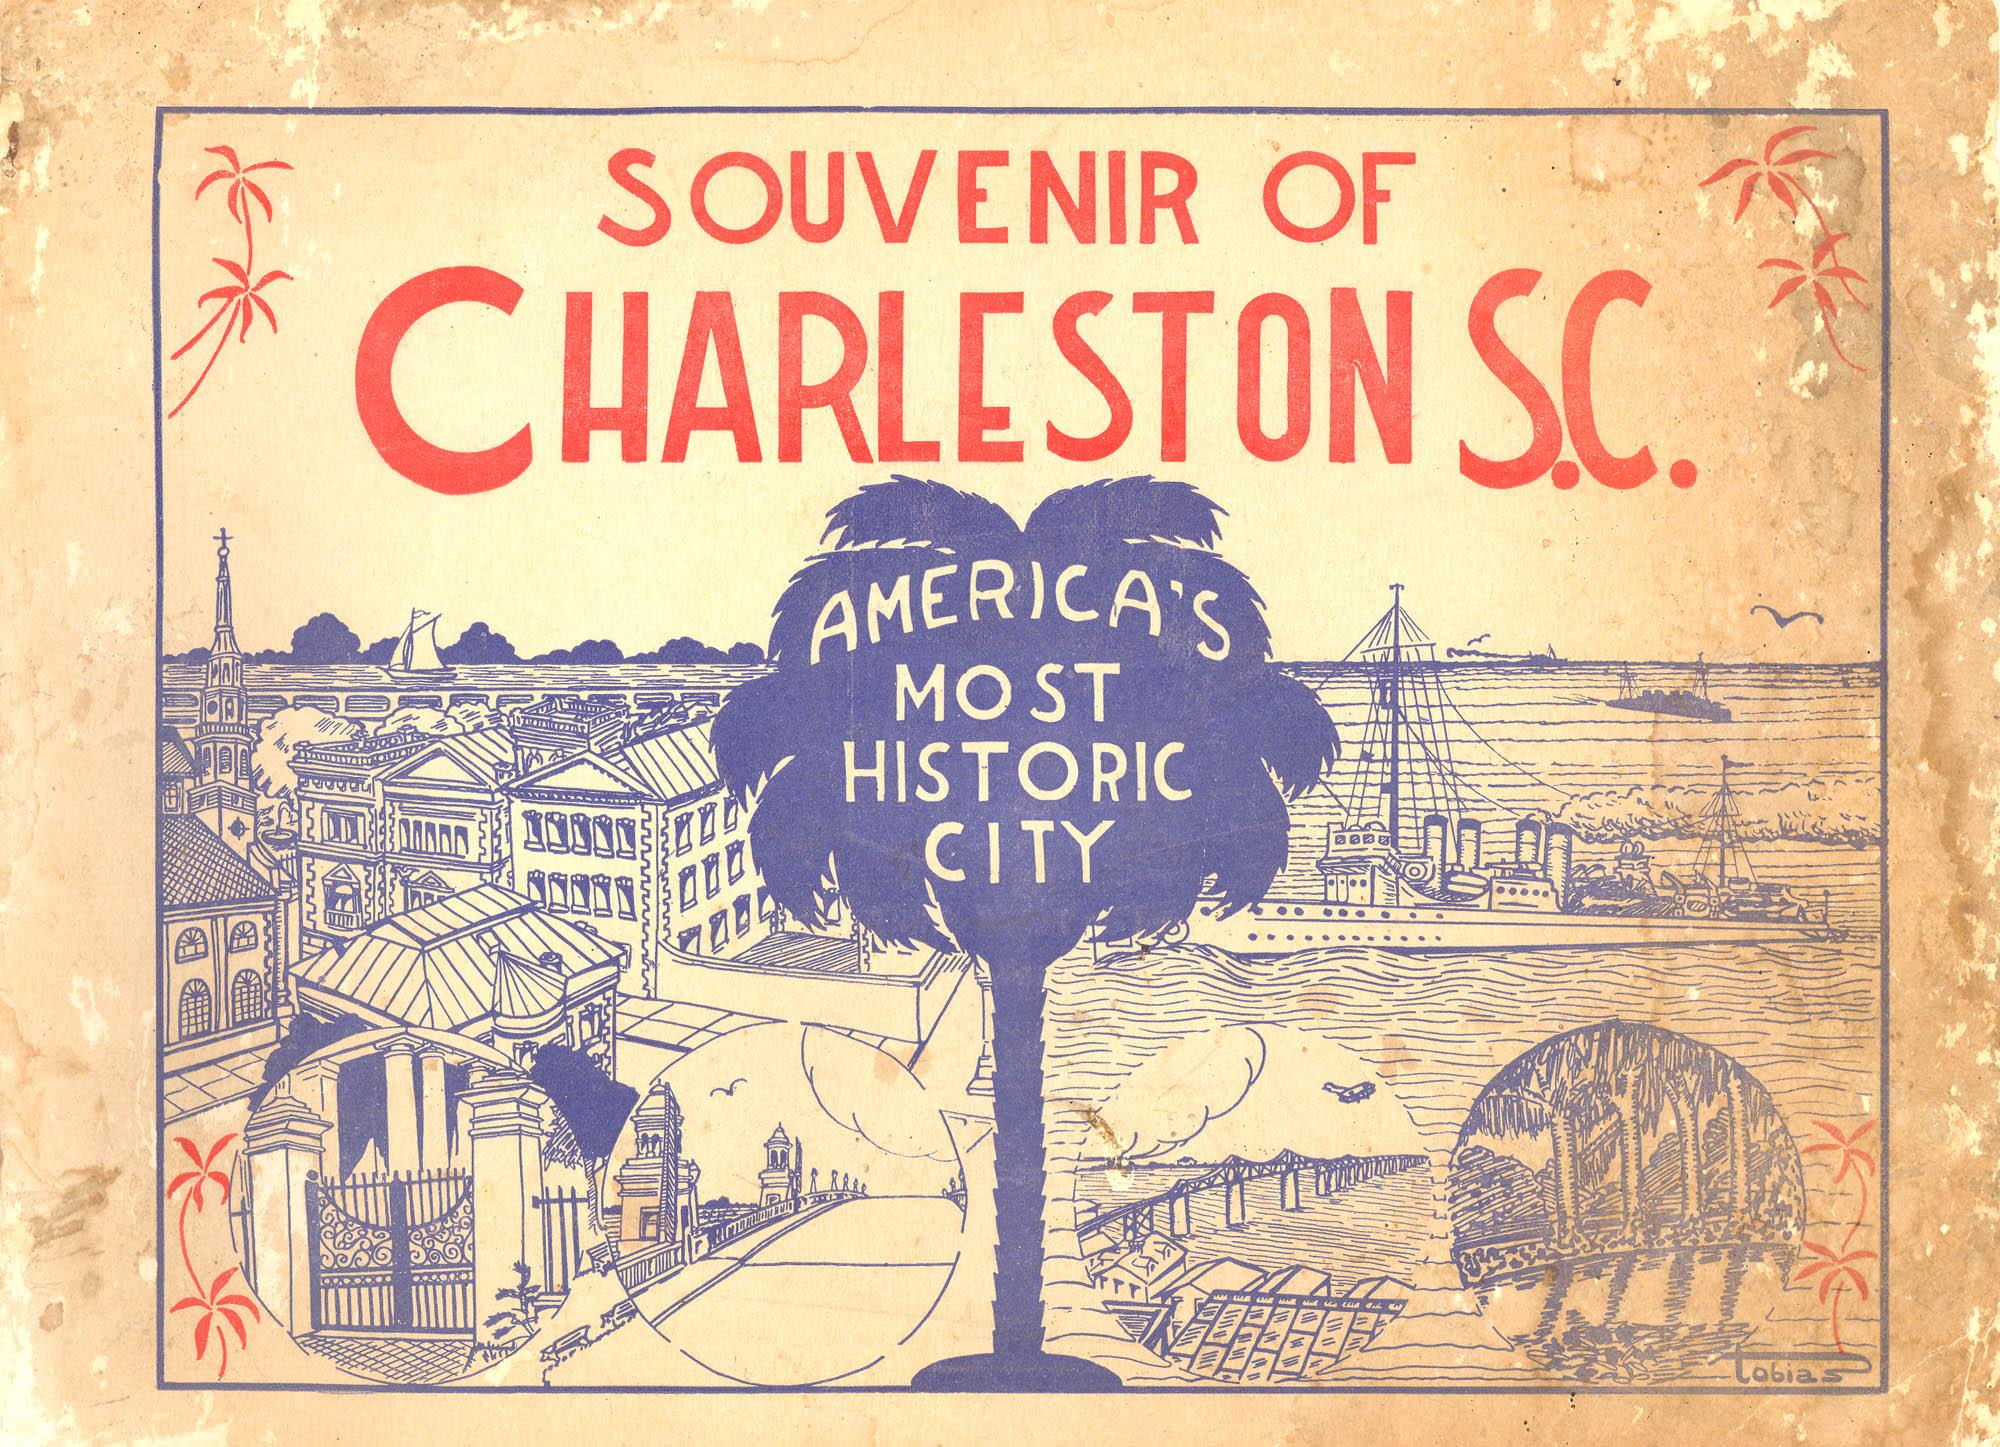 Souvenir of Charleston S.C.:  America's Most Historic City